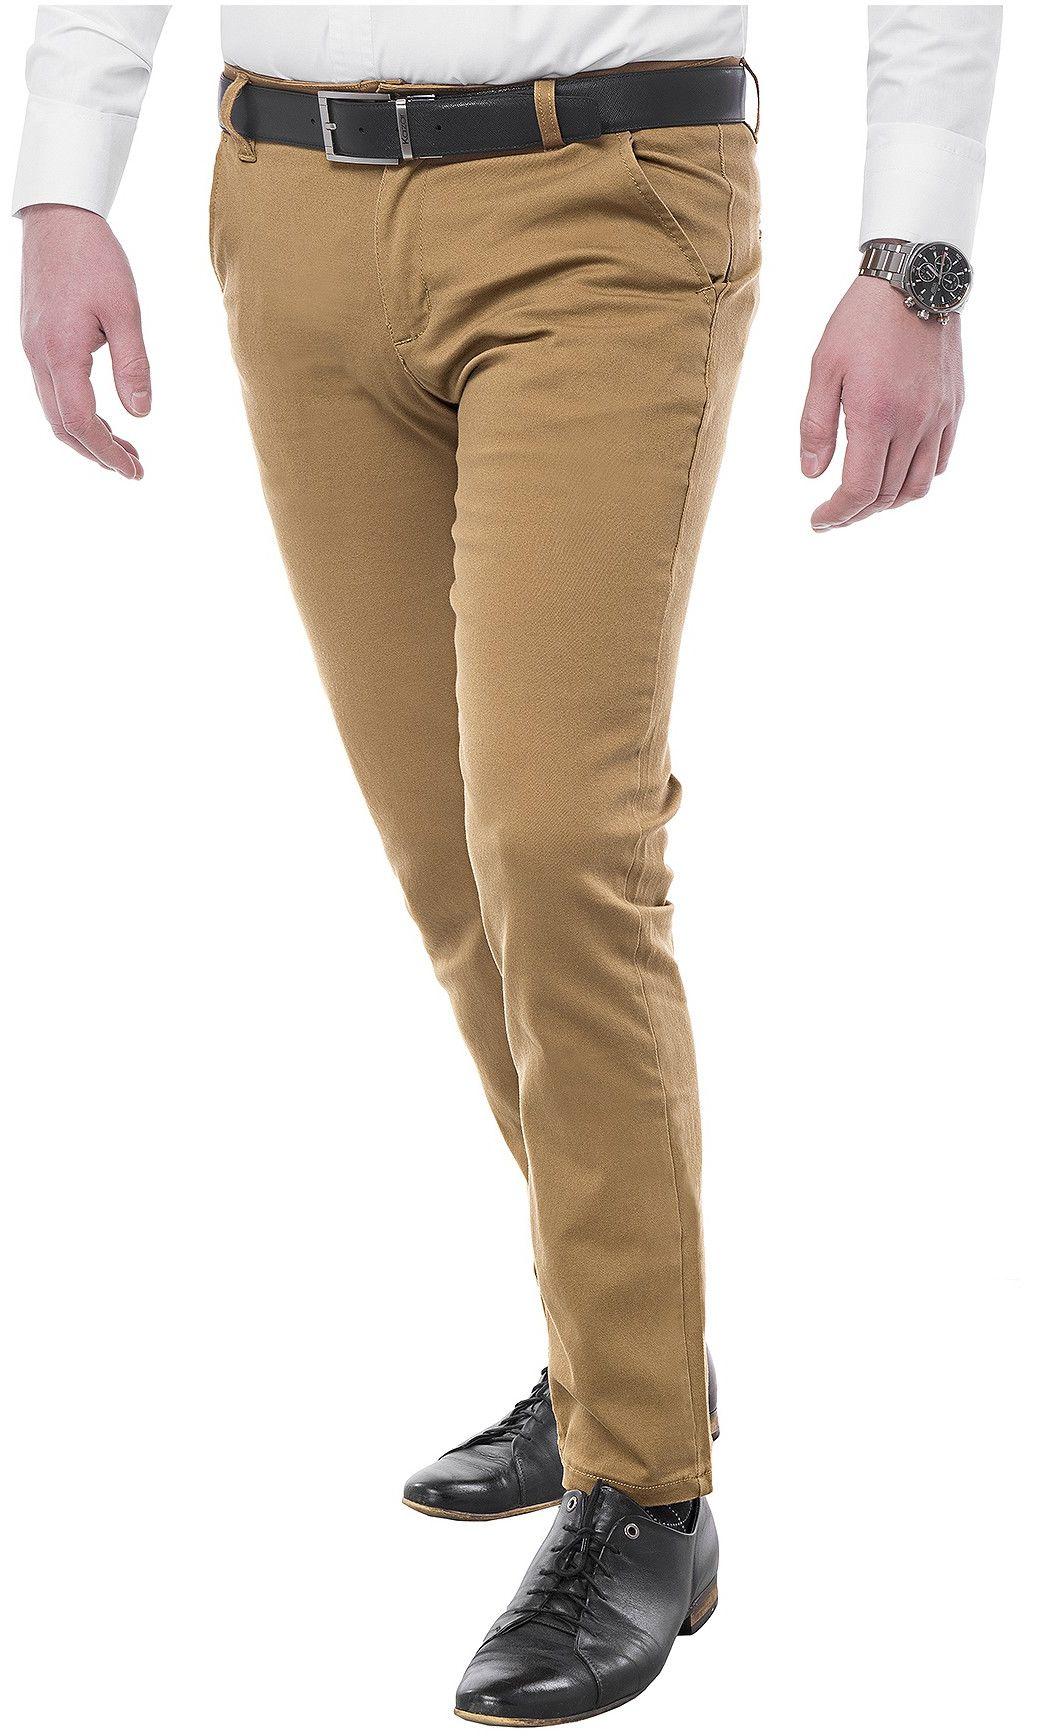 Spodnie męskie chinosy - 6101 - camelowe